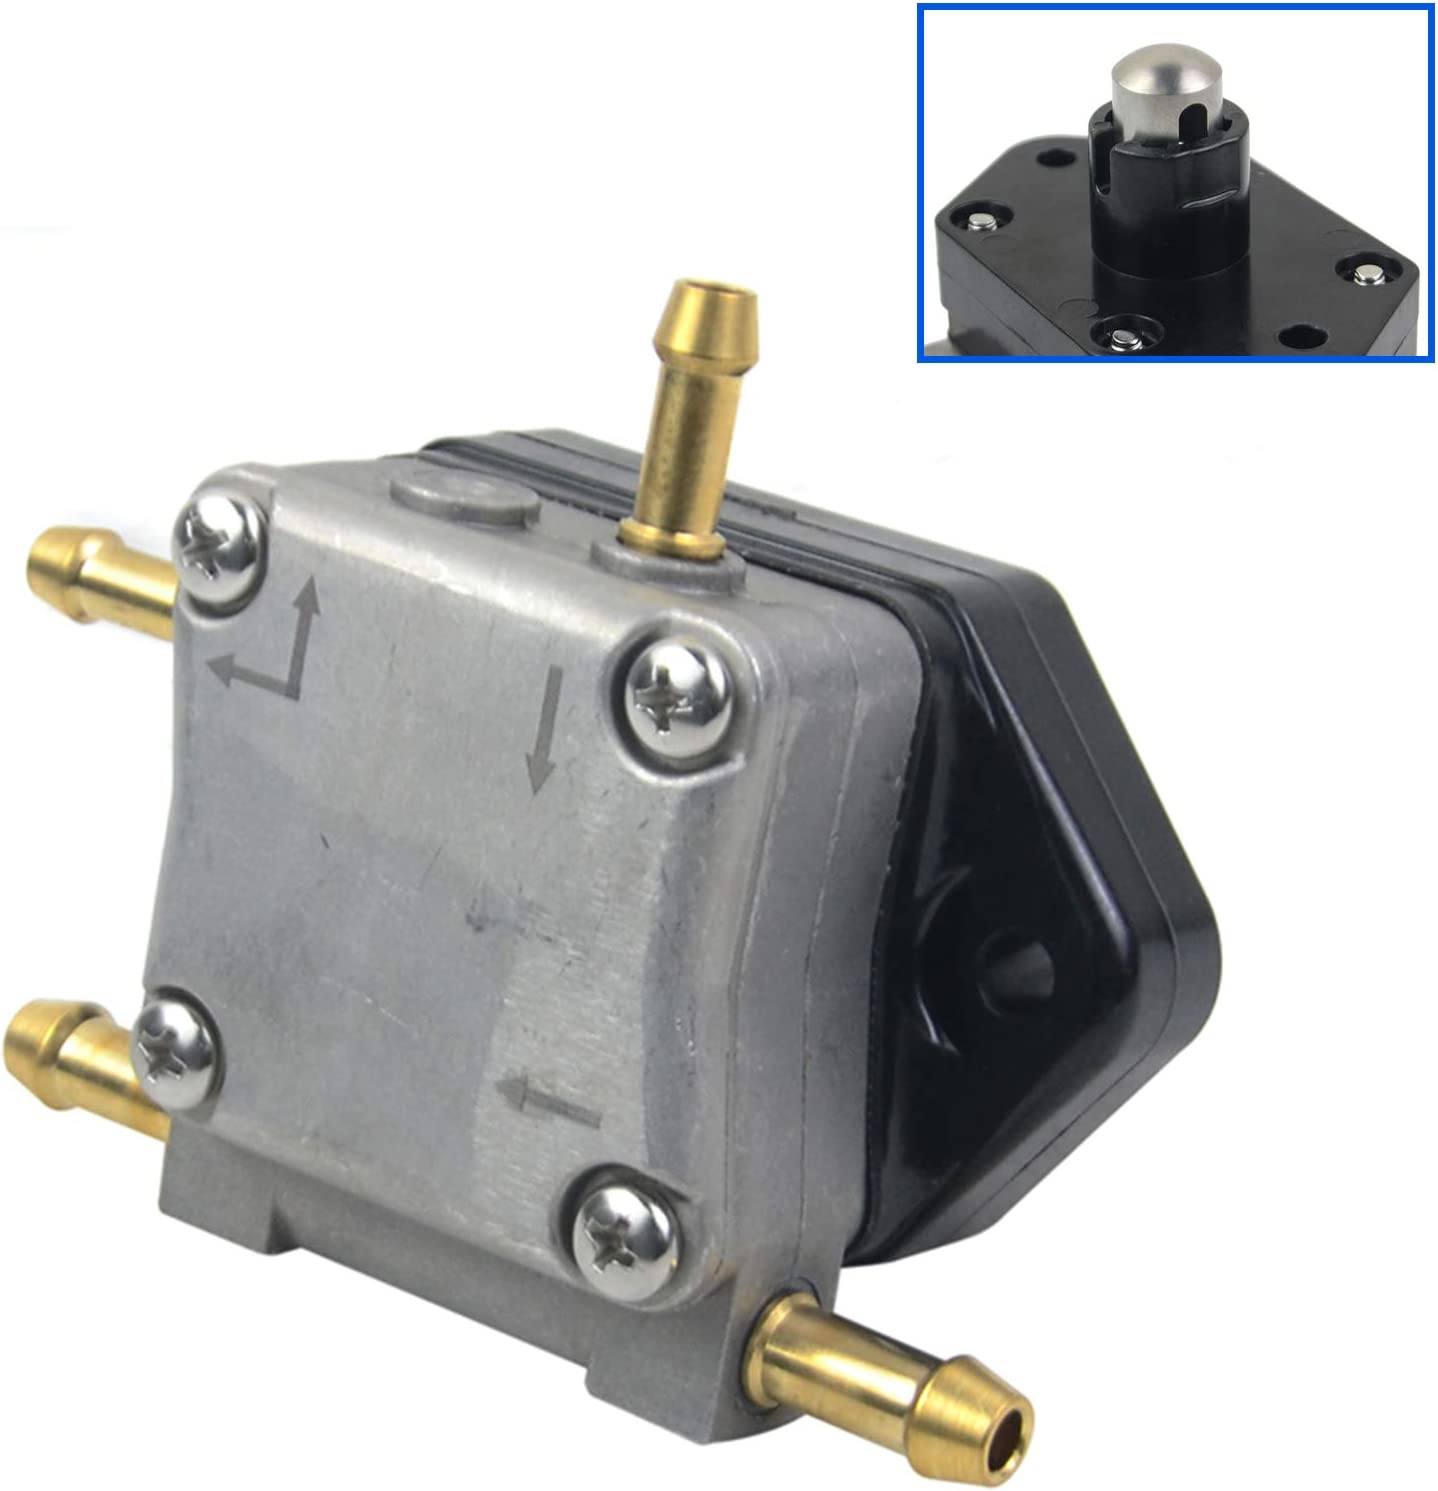 Watlike 18-8866 Fuel Pump for Mer-cury 4 Stroke Outboard 30HP 40HP 50HP 60HP Engine 8M0118177 892874T01 899106T01 881862T